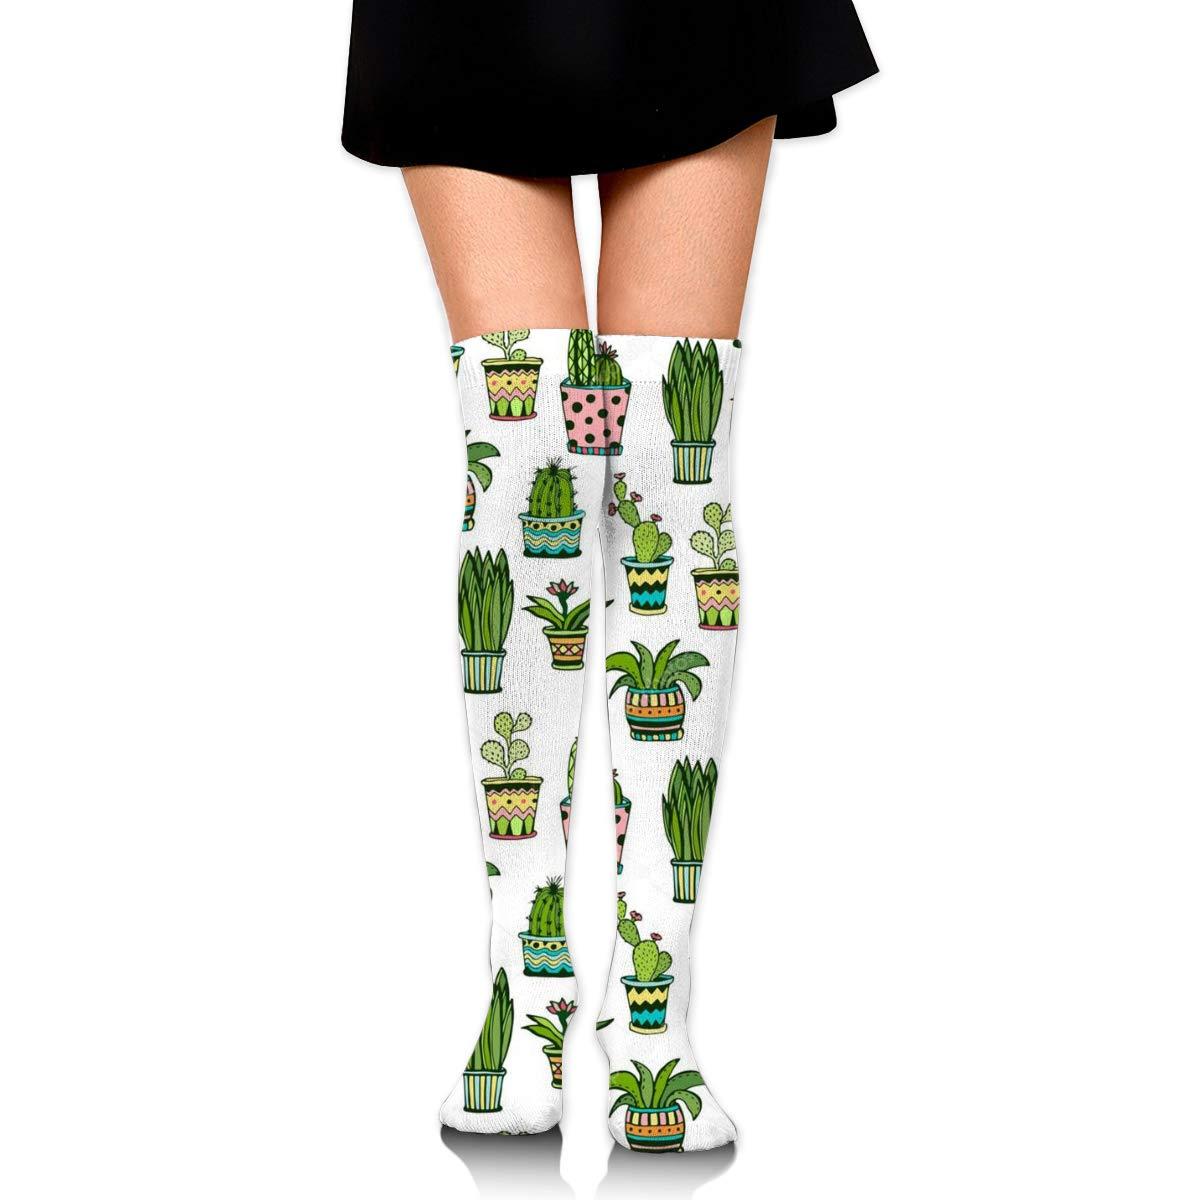 Women Crew Socks Thigh High Knee Succulent Cactus Long Tube Dress Legging Sport Compression Stocking